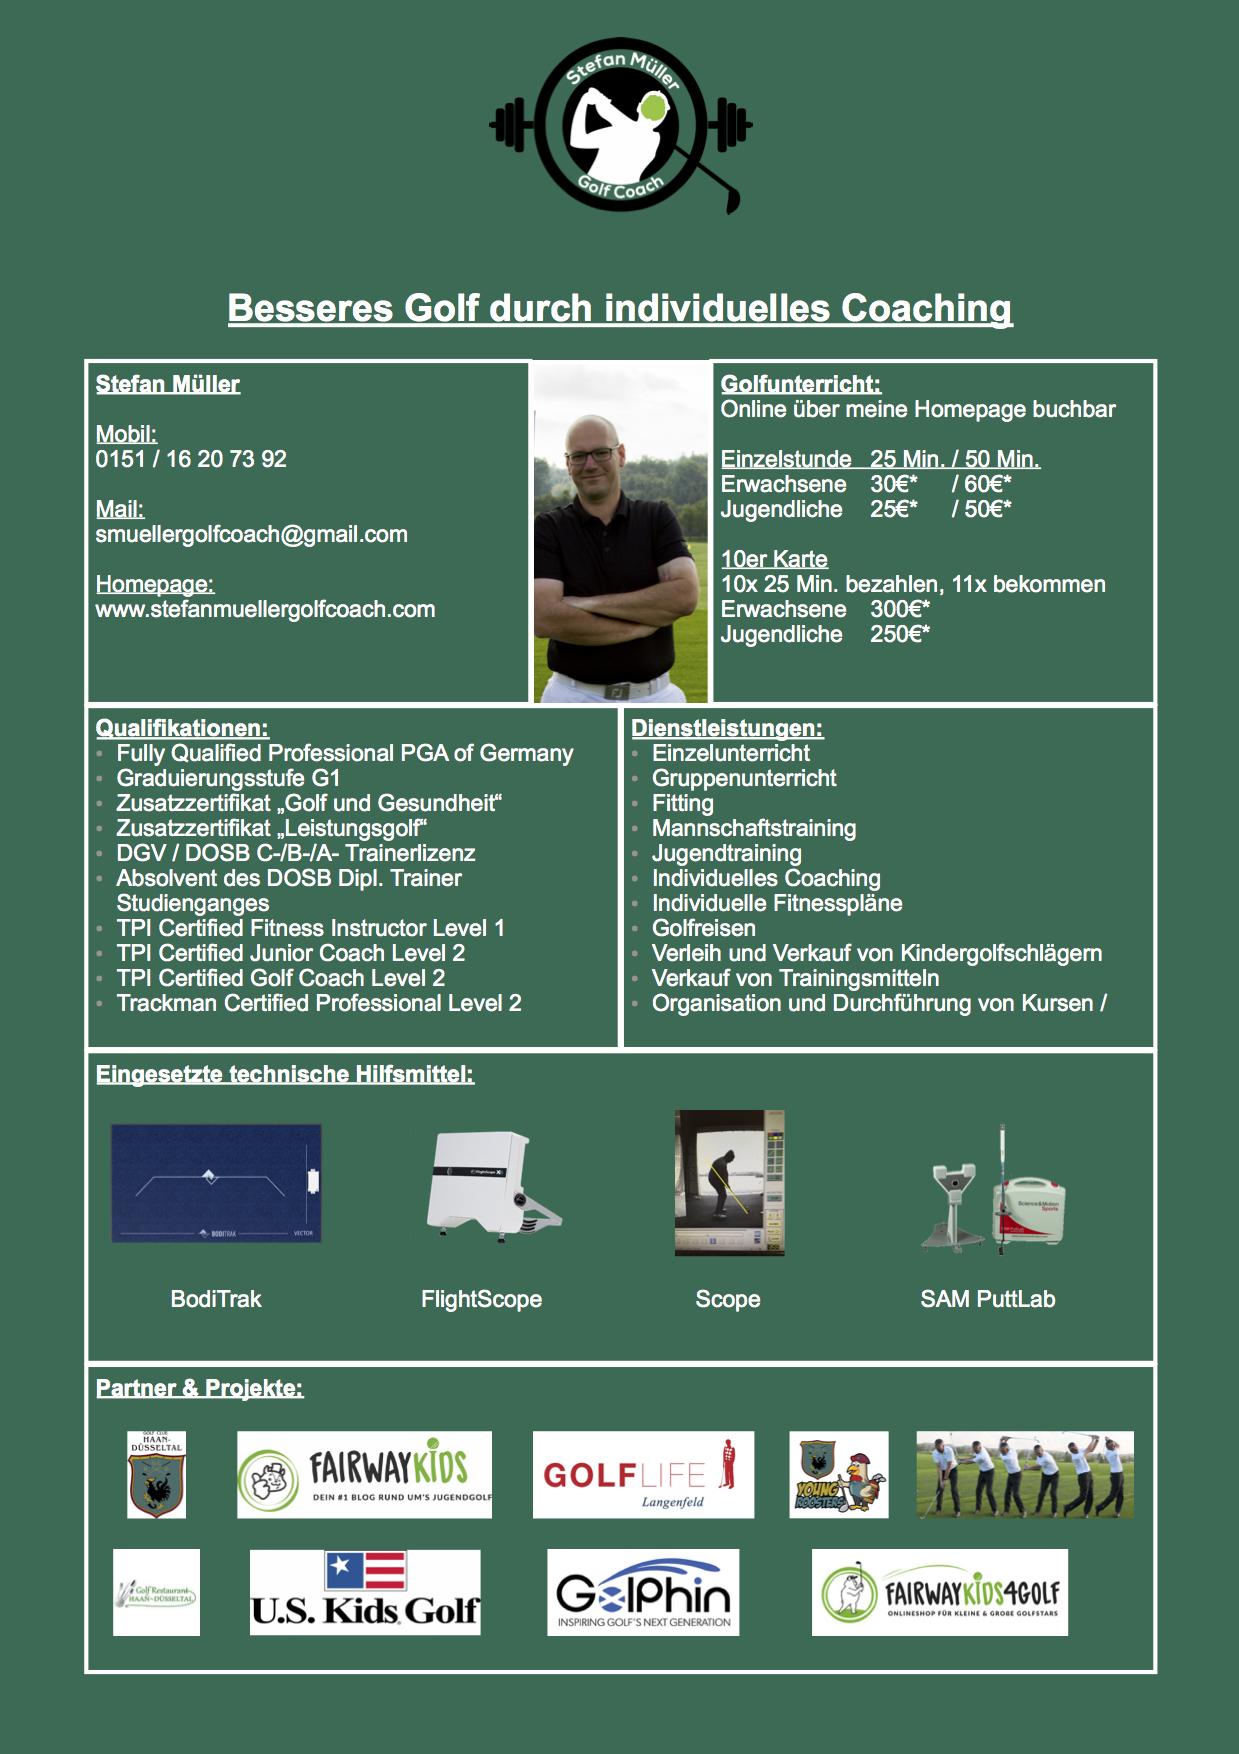 SMGC Info